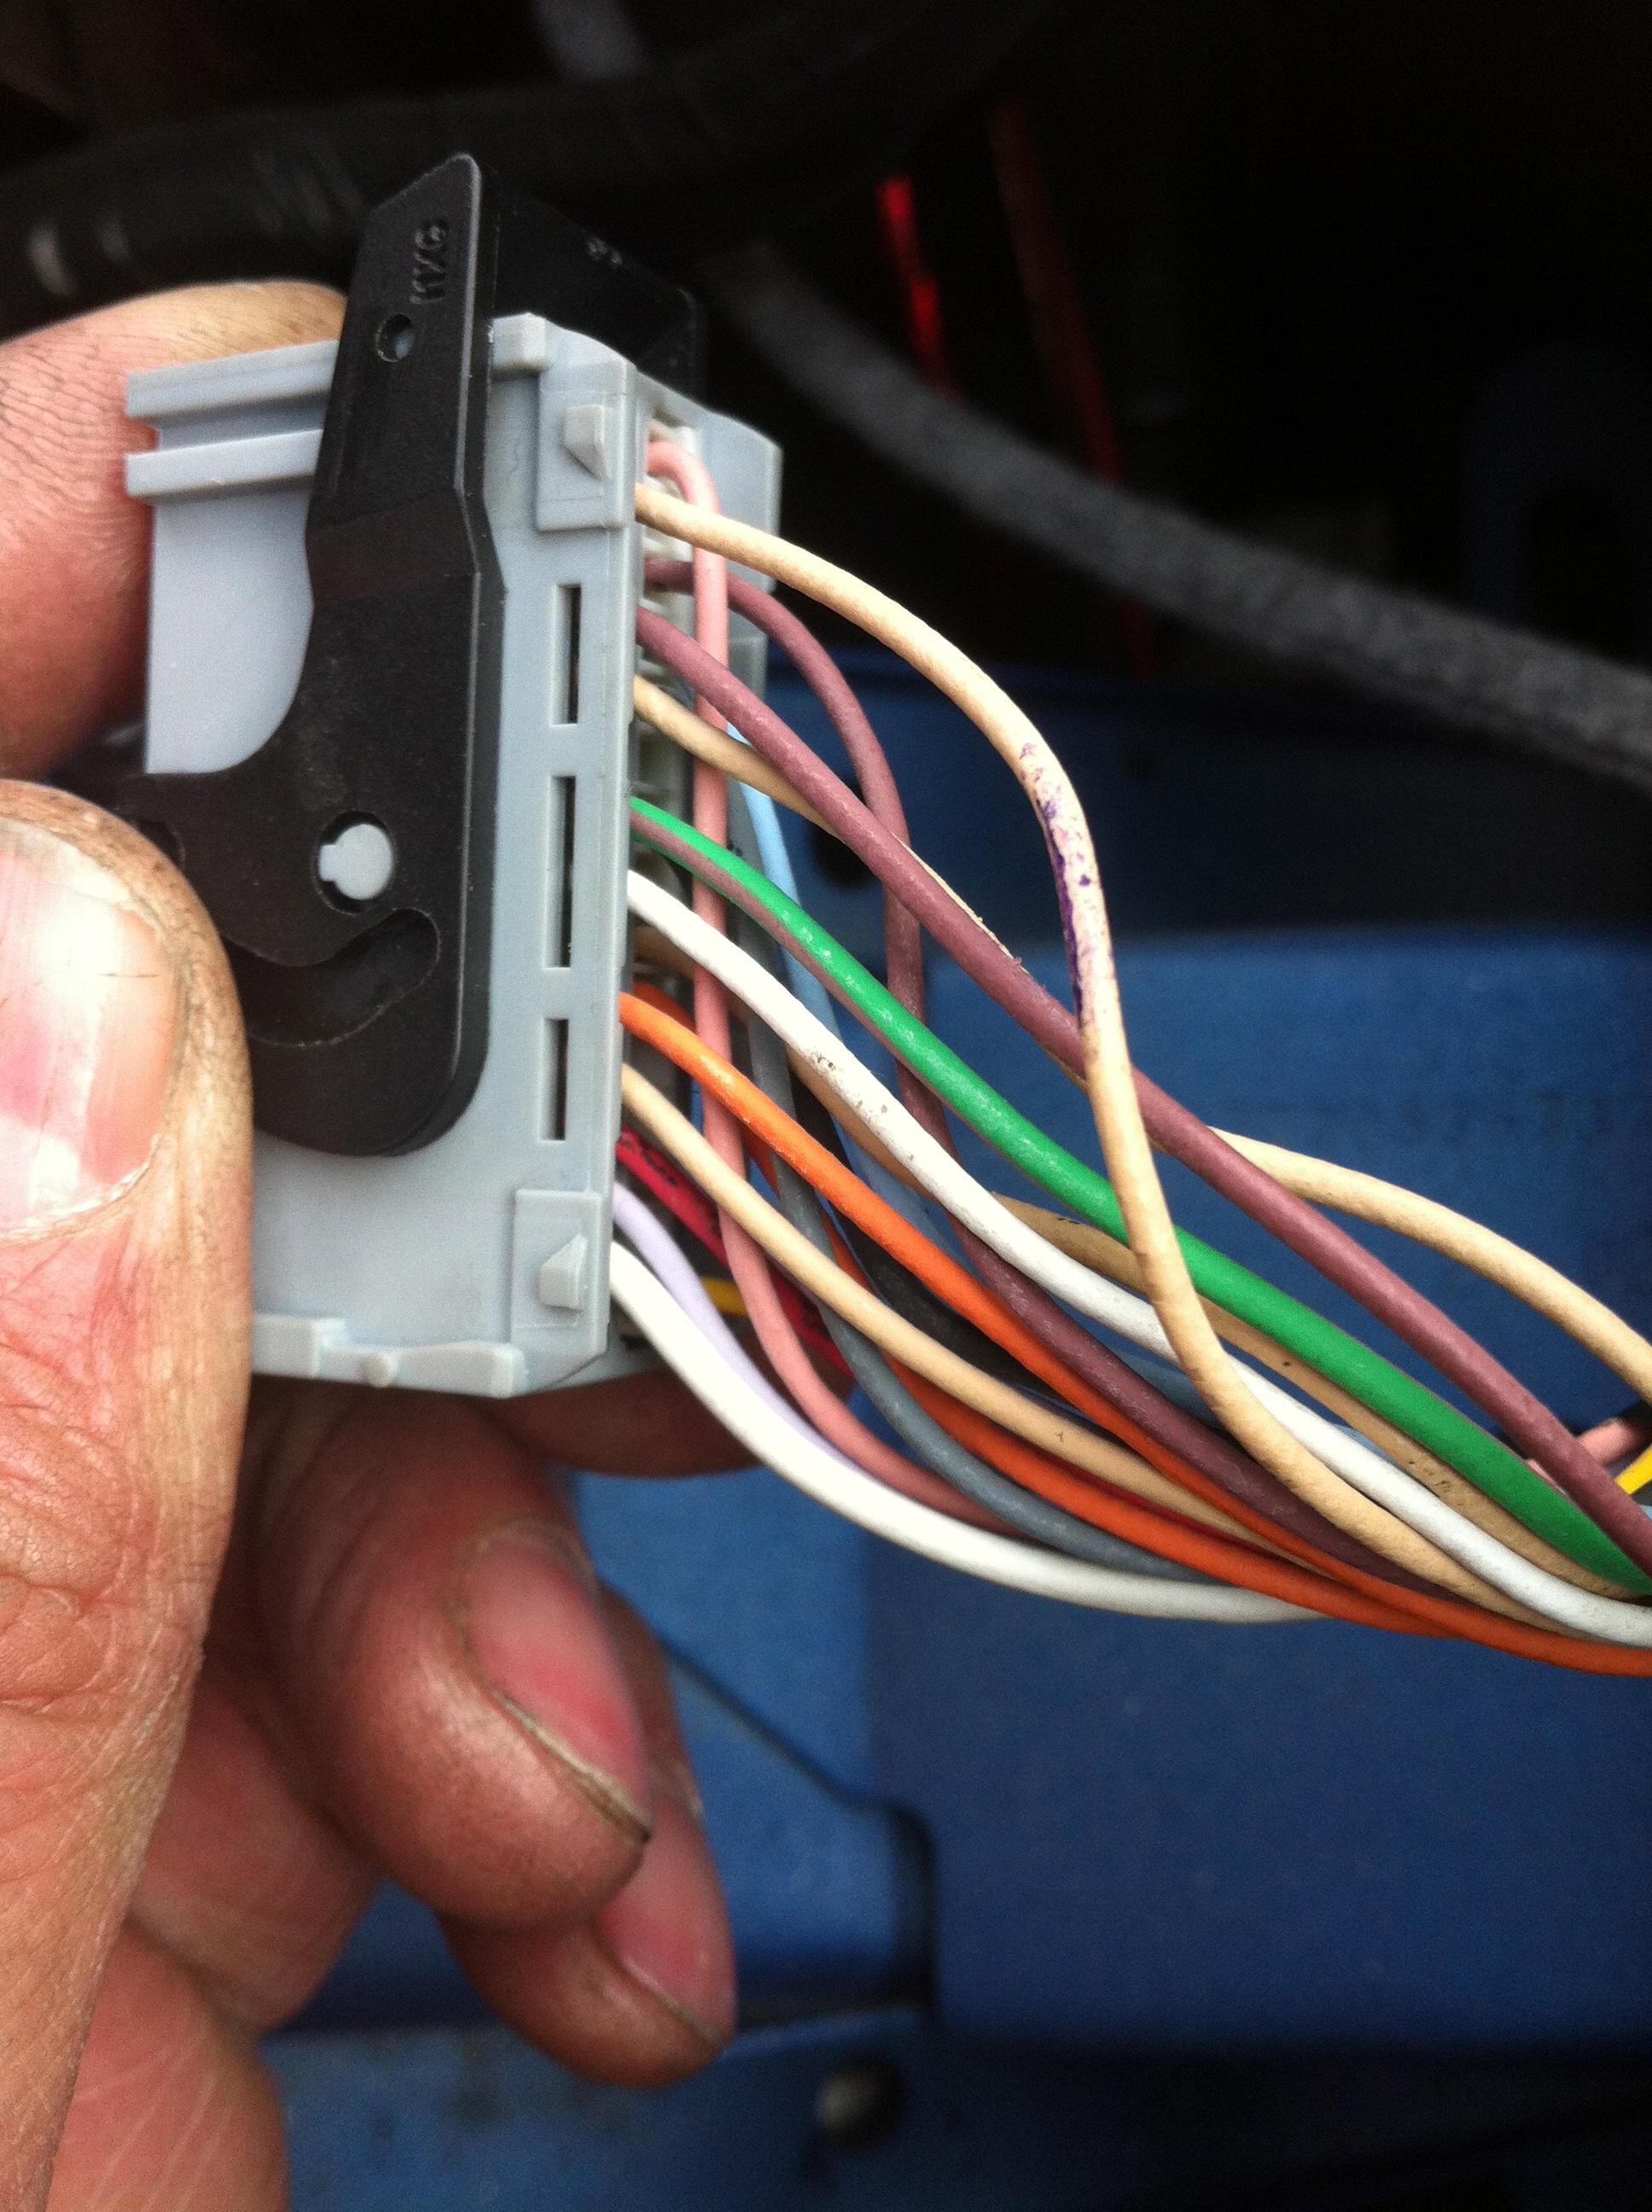 Wiring diagram for connectors into speedo ClioSportnet